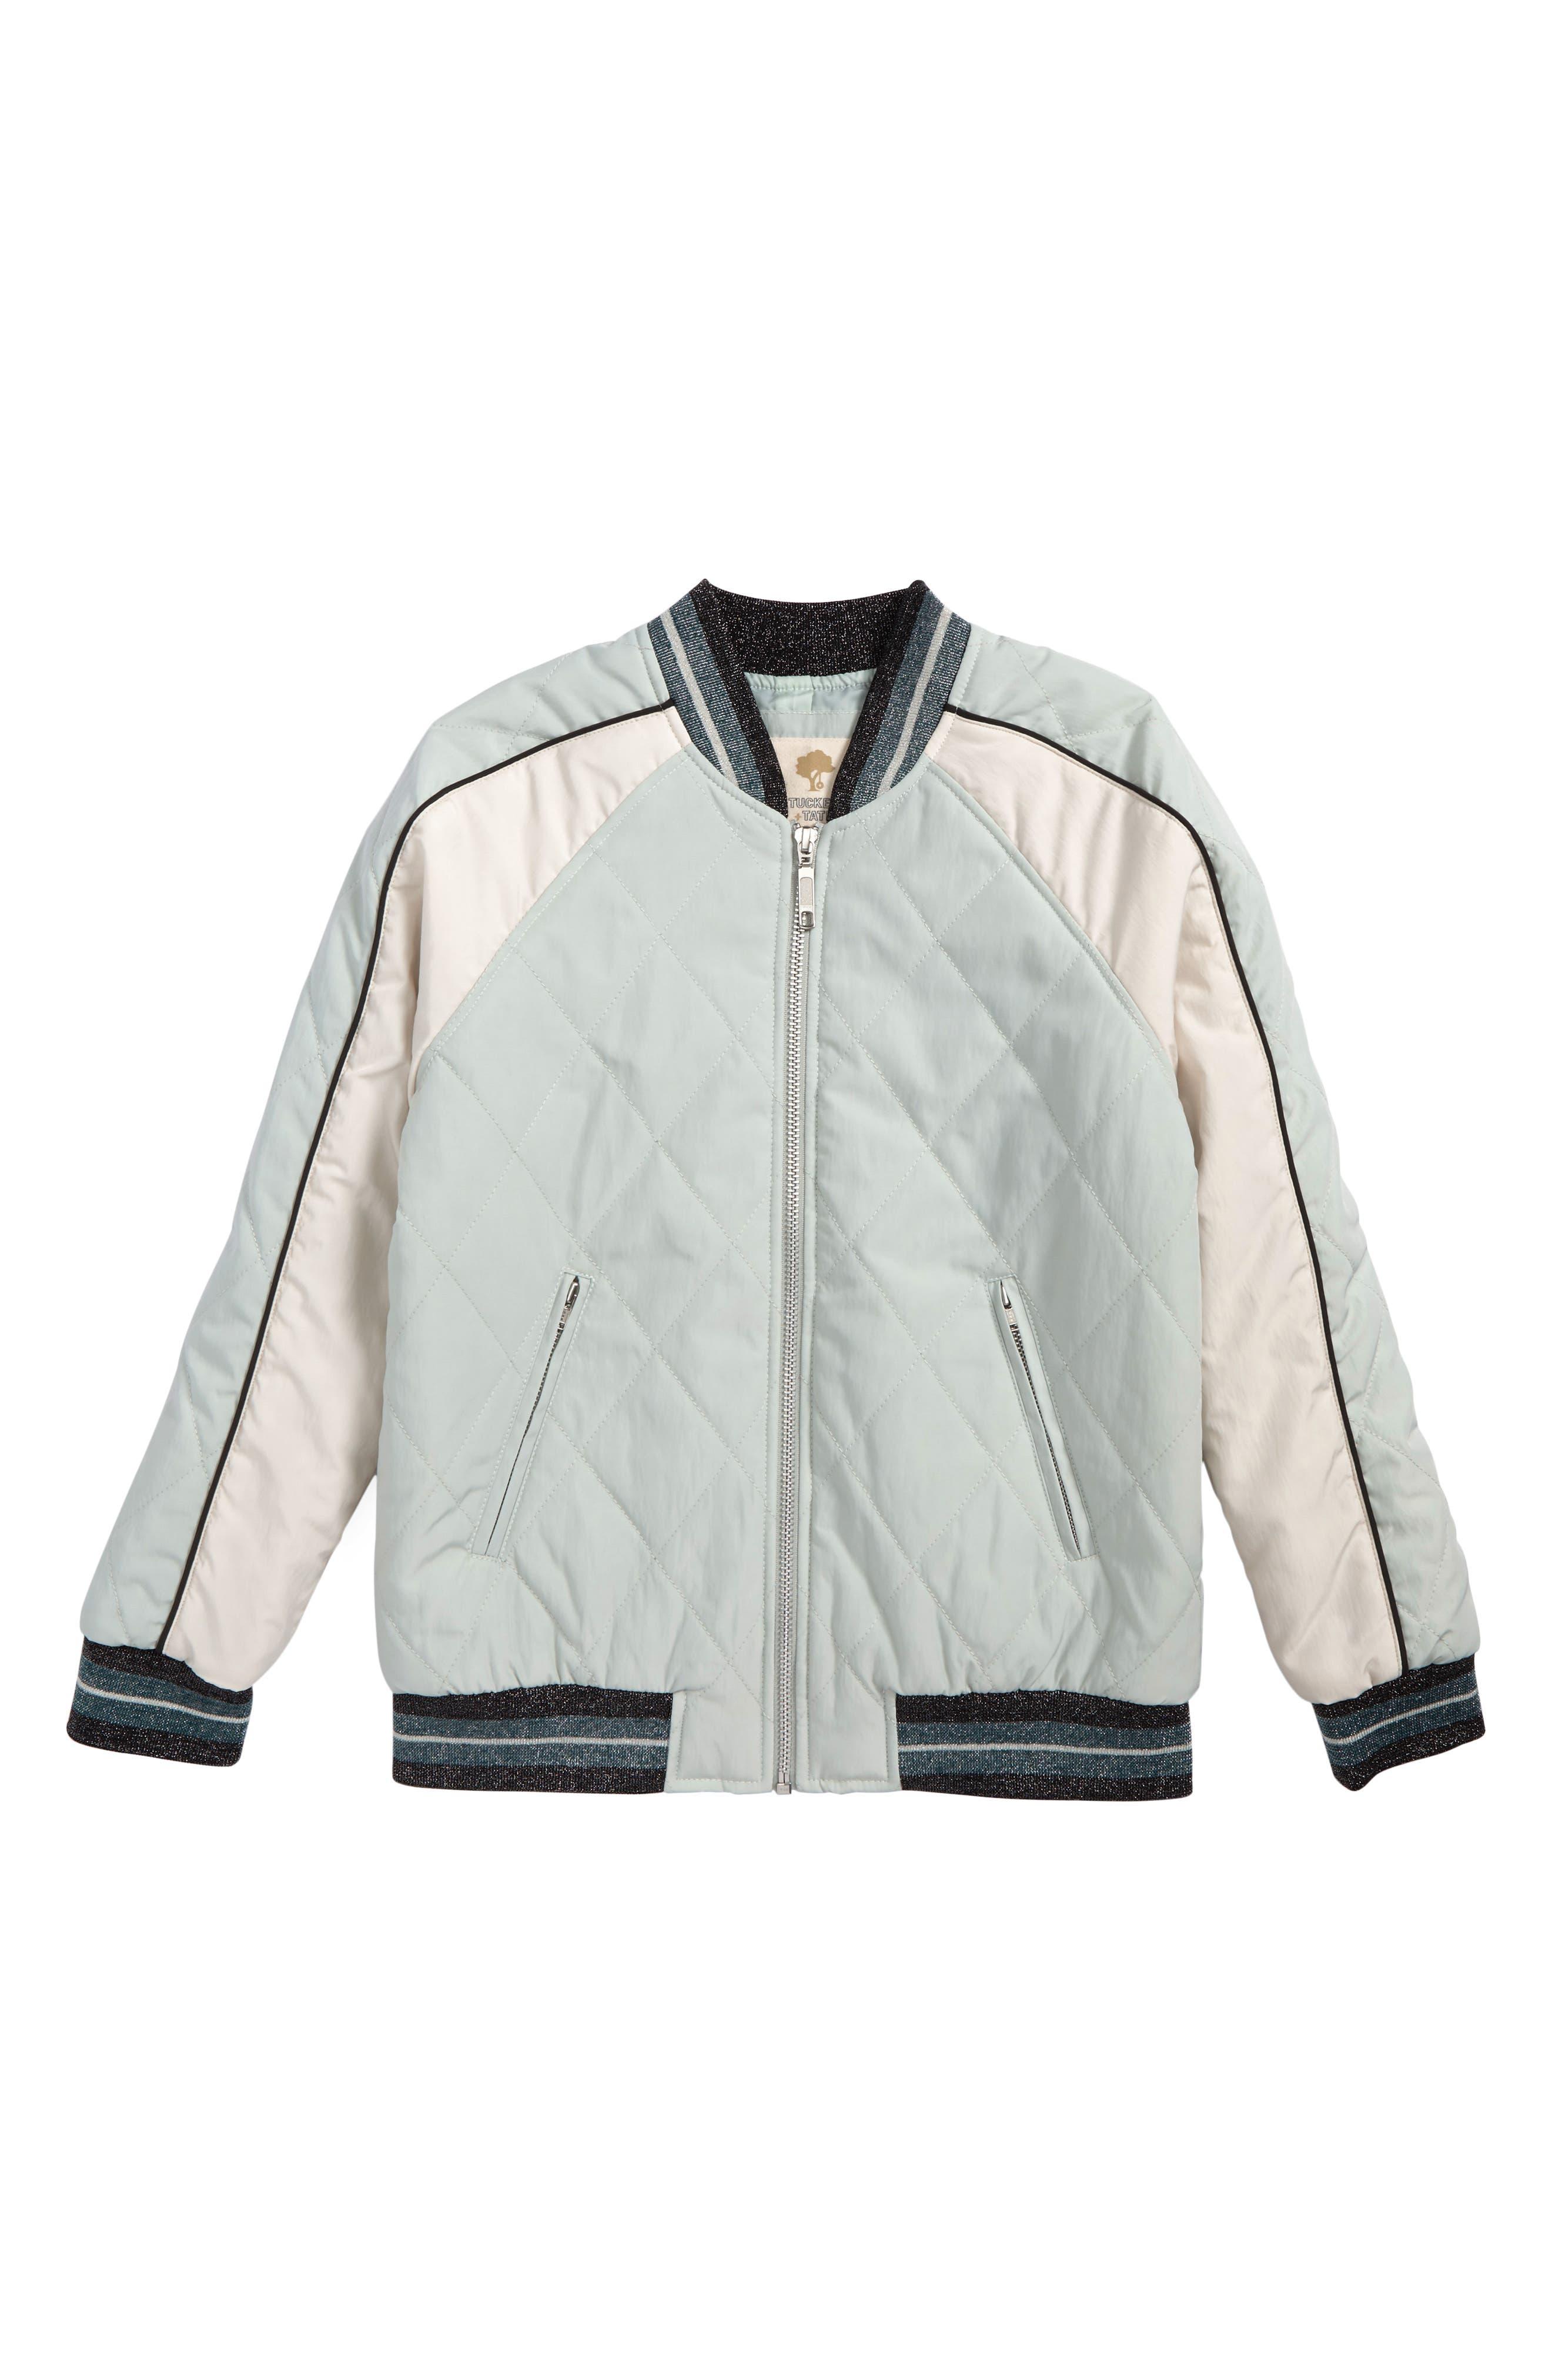 Alternate Image 1 Selected - Tucker + Tate Colorblock Bomber Jacket (Big Girls)